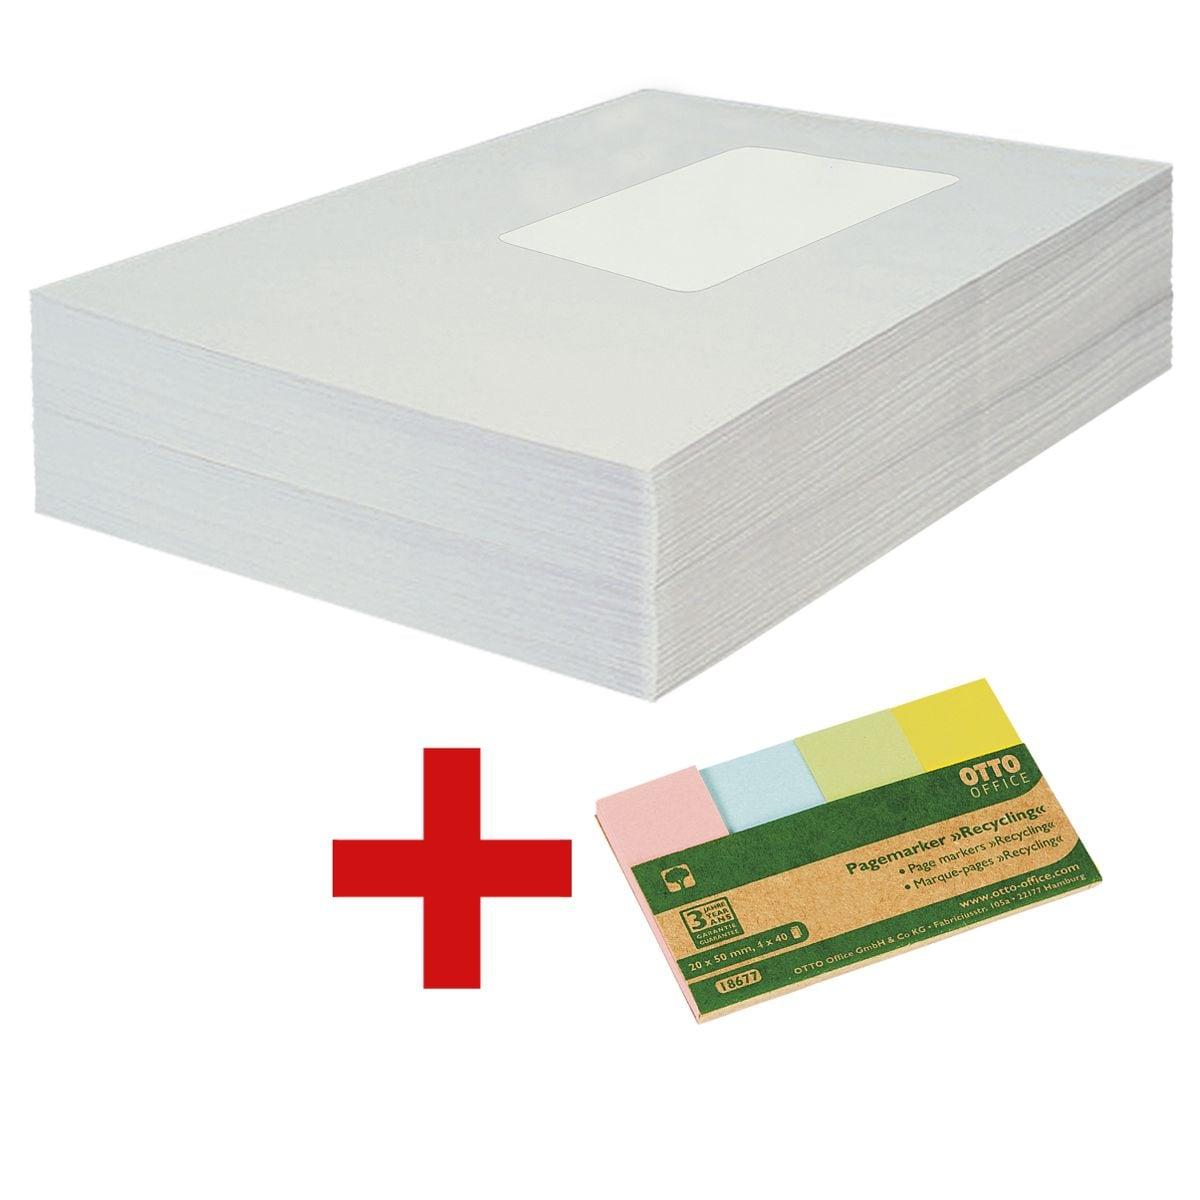 Recycling-Briefumschläge OTTO Office Nature, C5 100 g/m² mit Fenster, selbstklebend - 500 Stück inkl. Pagemarker »Recycling« 20 x 50 mm